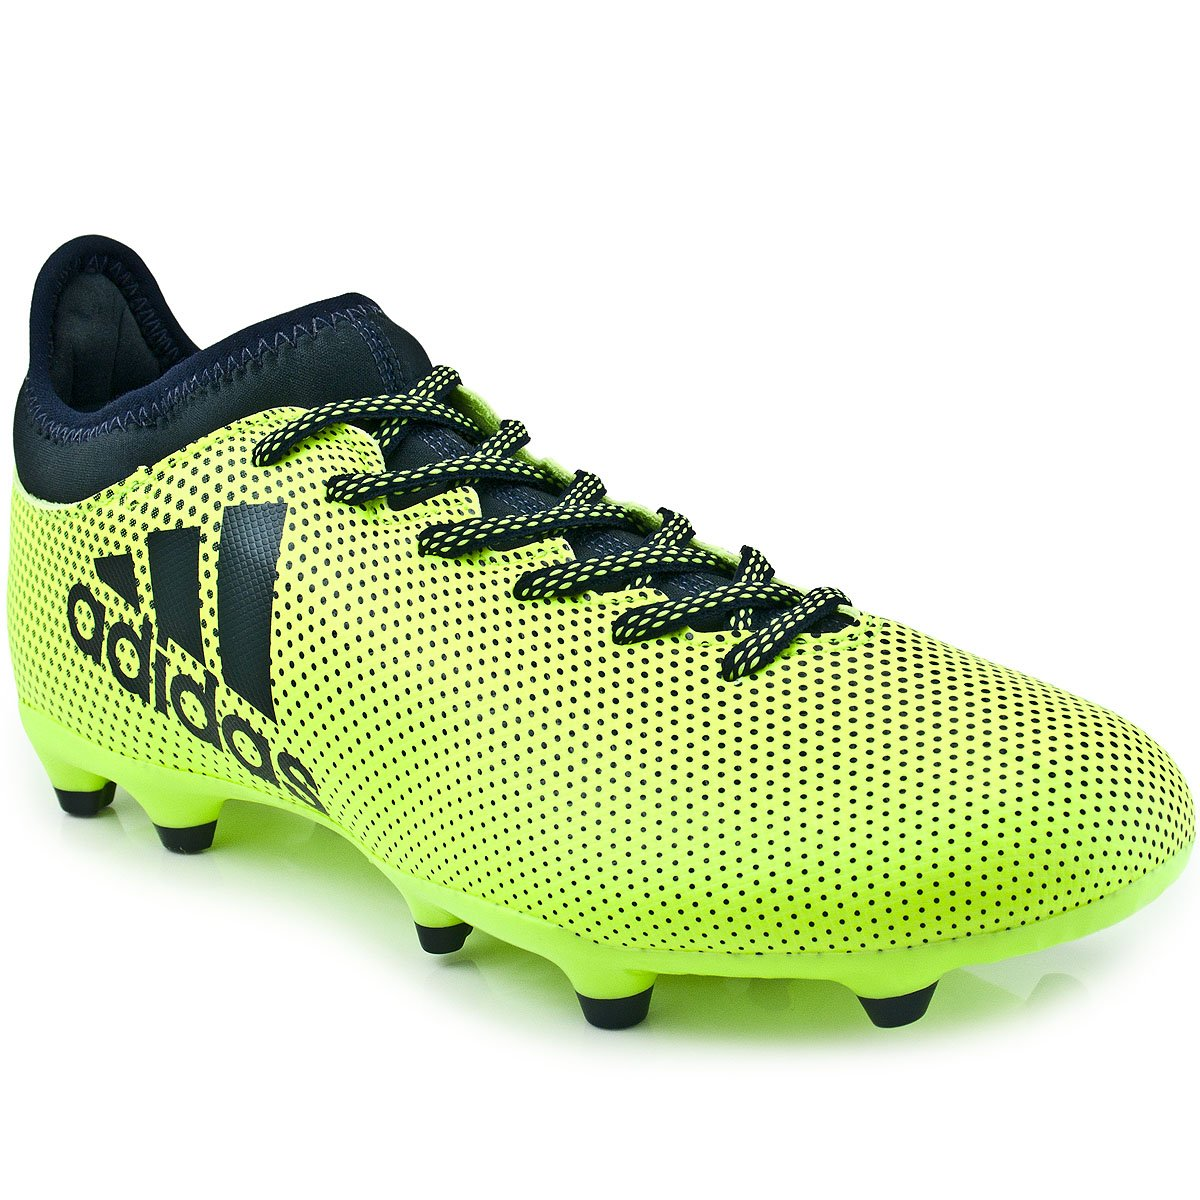 20296f5335 Chuteira Adidas X 17.3 FG